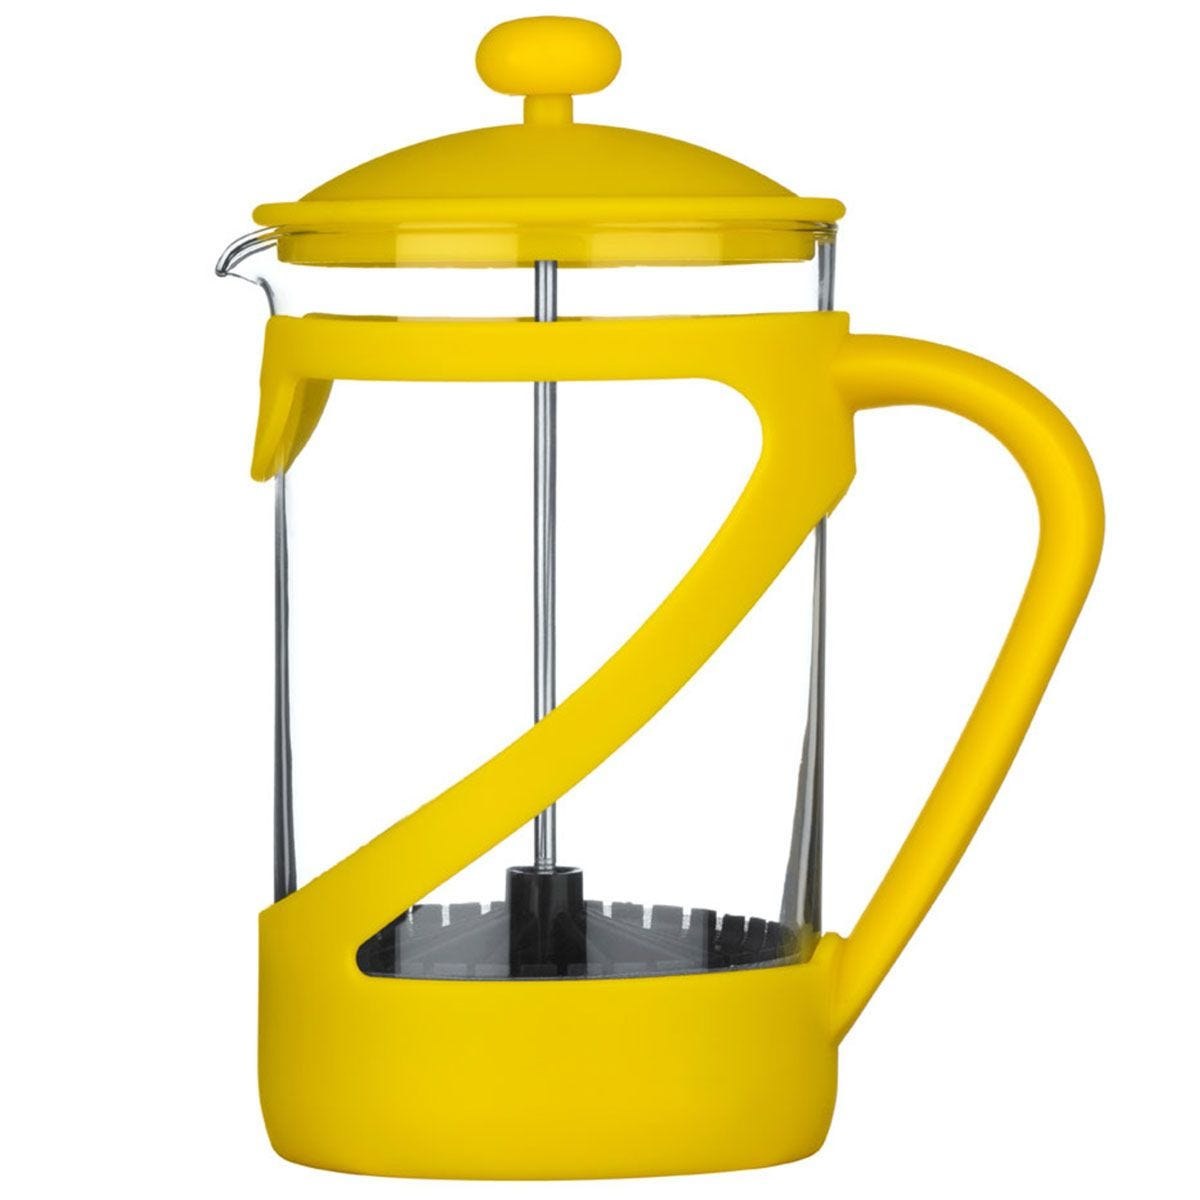 Premier Housewares Kenya 6-Cup Cafetiere - Yellow